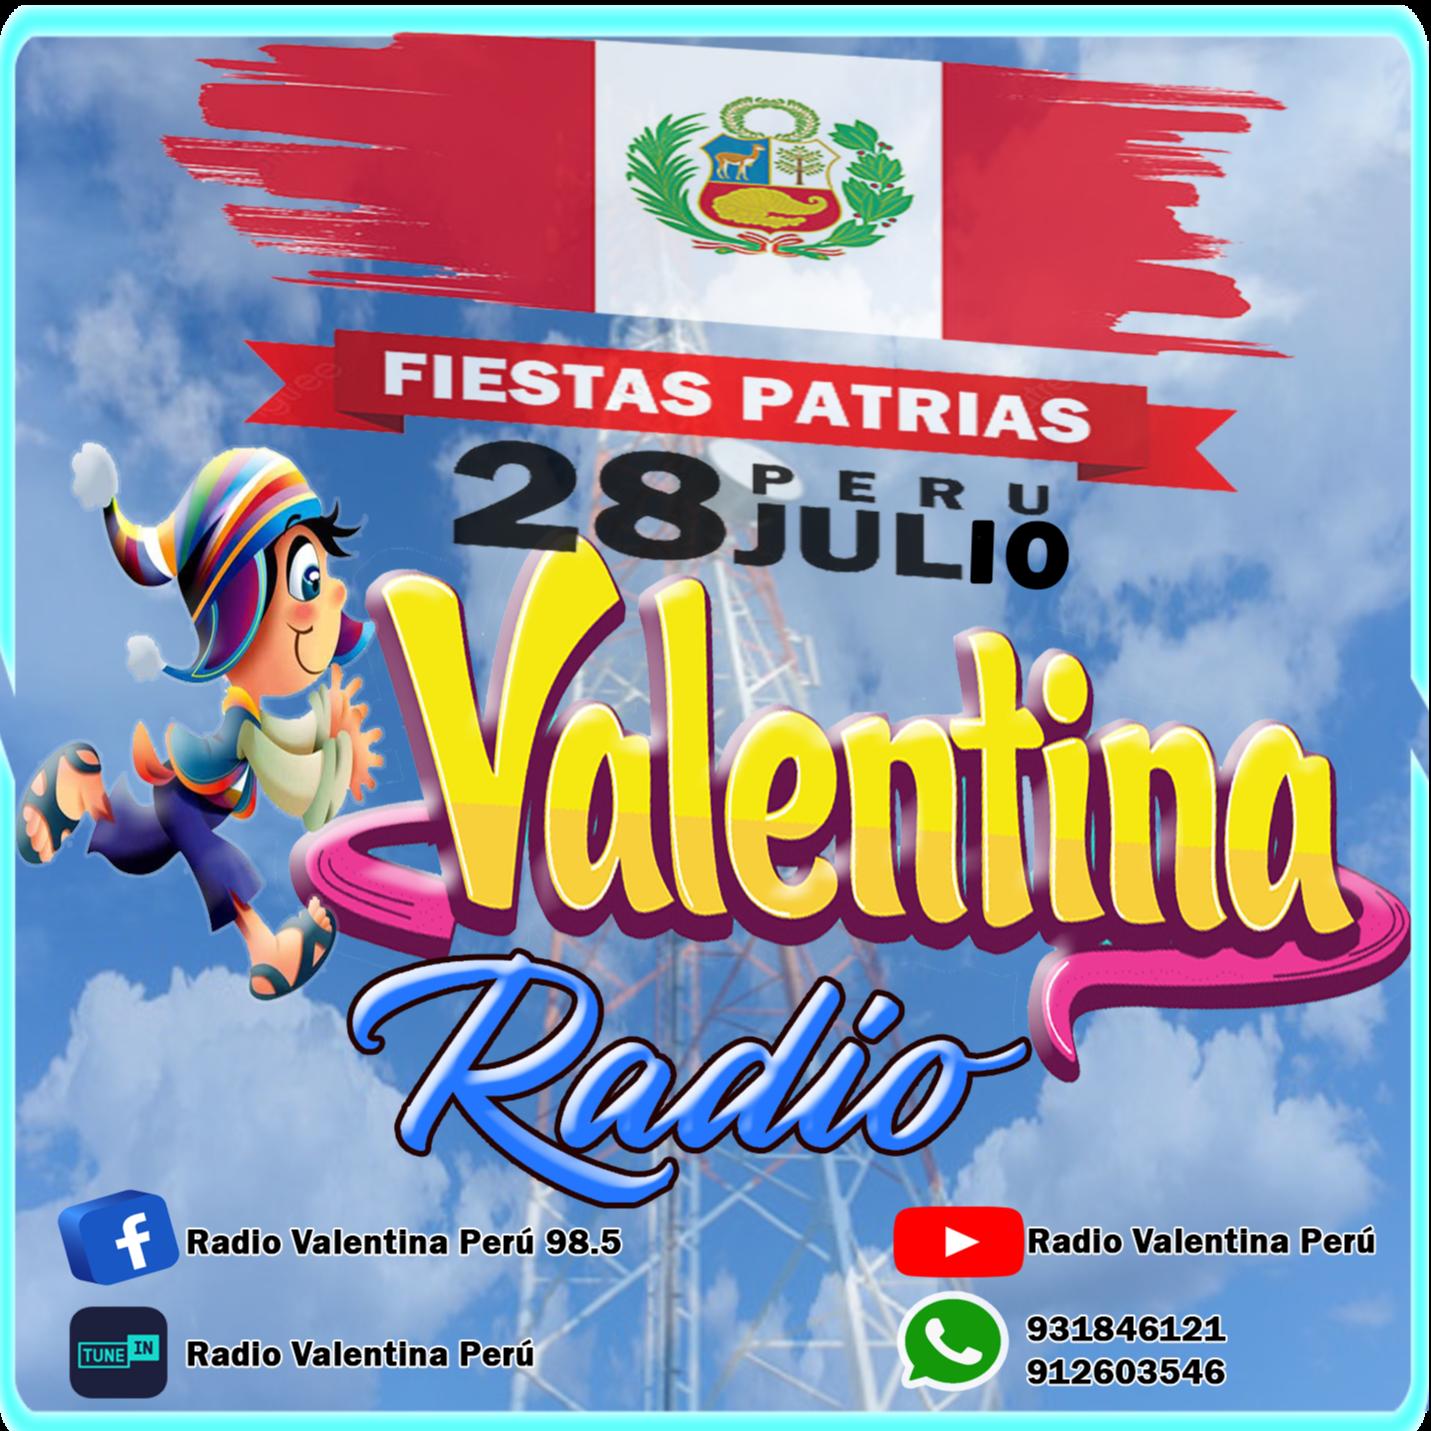 Radio Valentina Peru